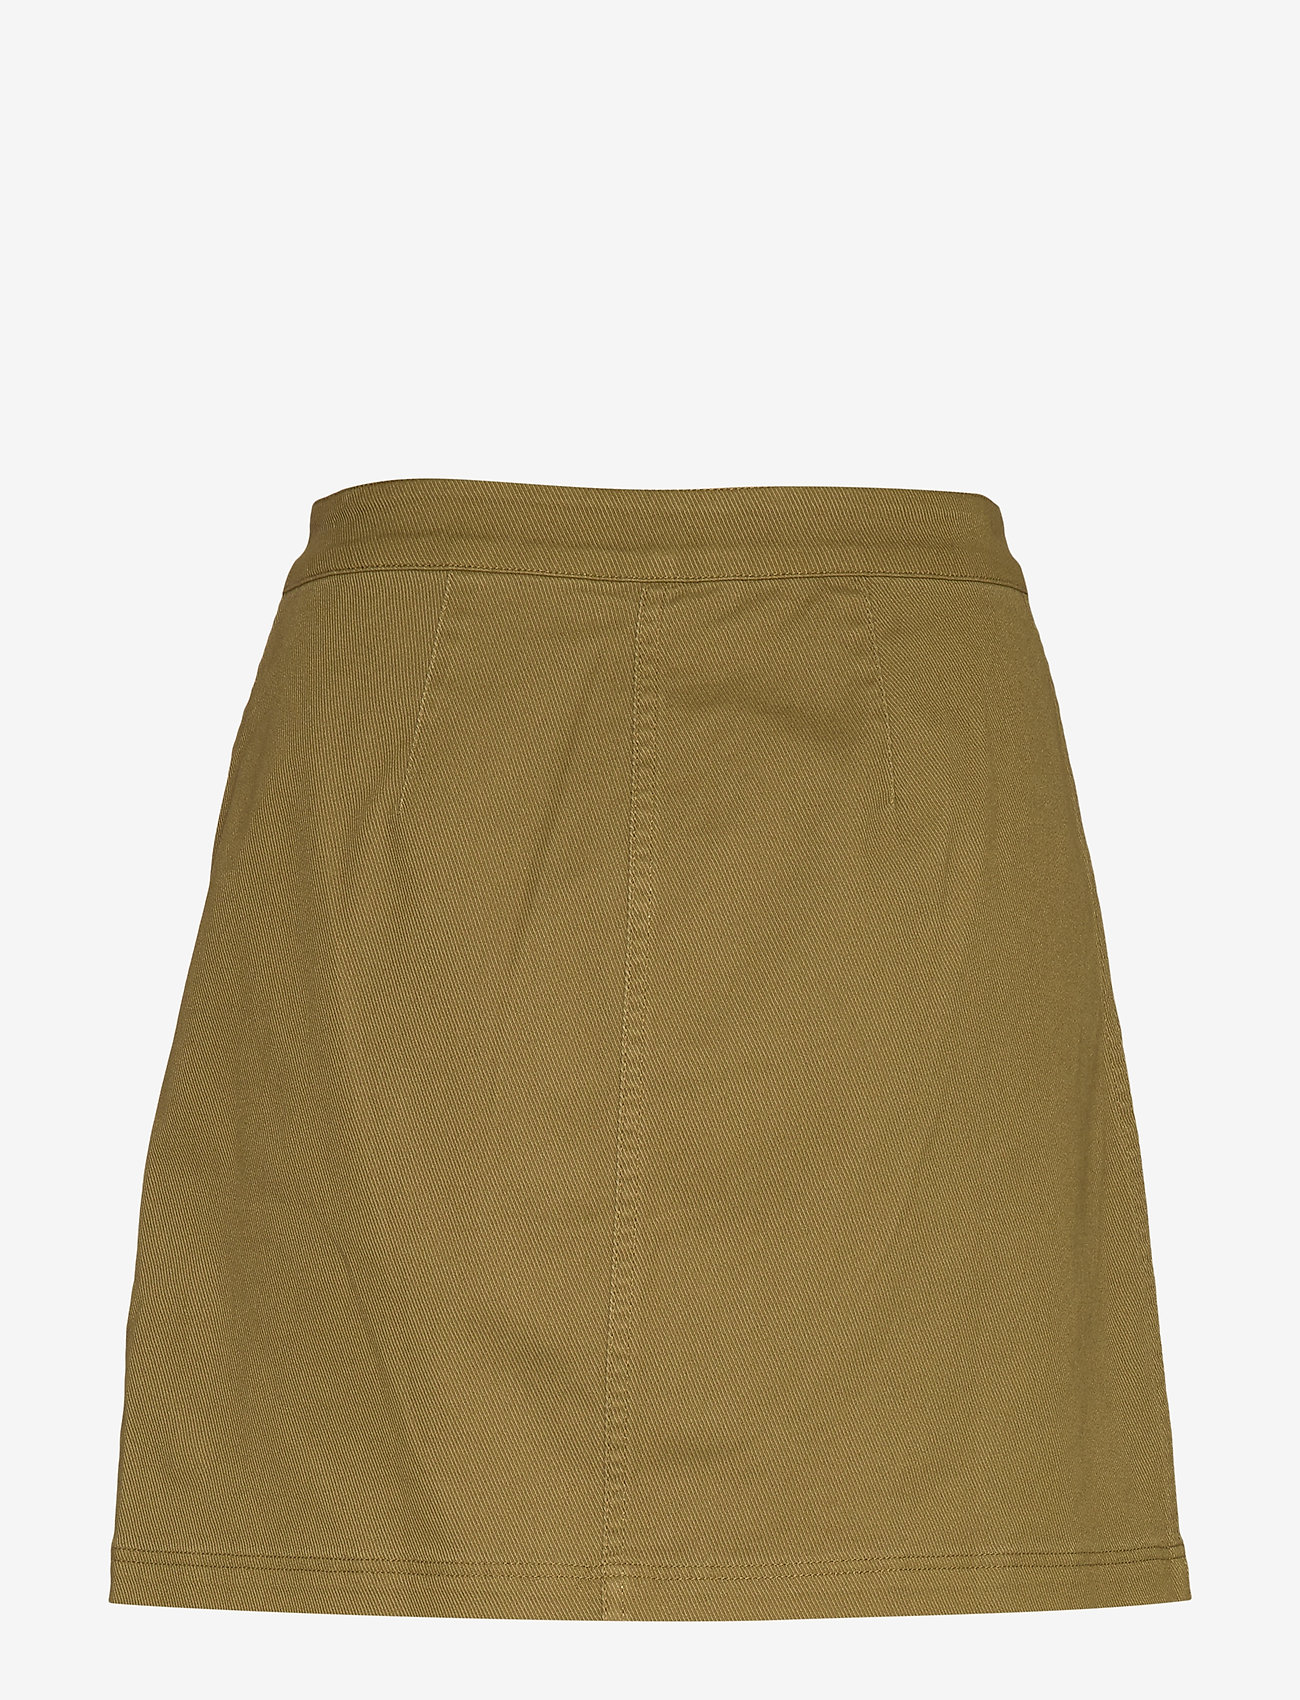 Tommy Jeans - TJW CARPENTER SKIRT - jupes courtes - martini olive - 1